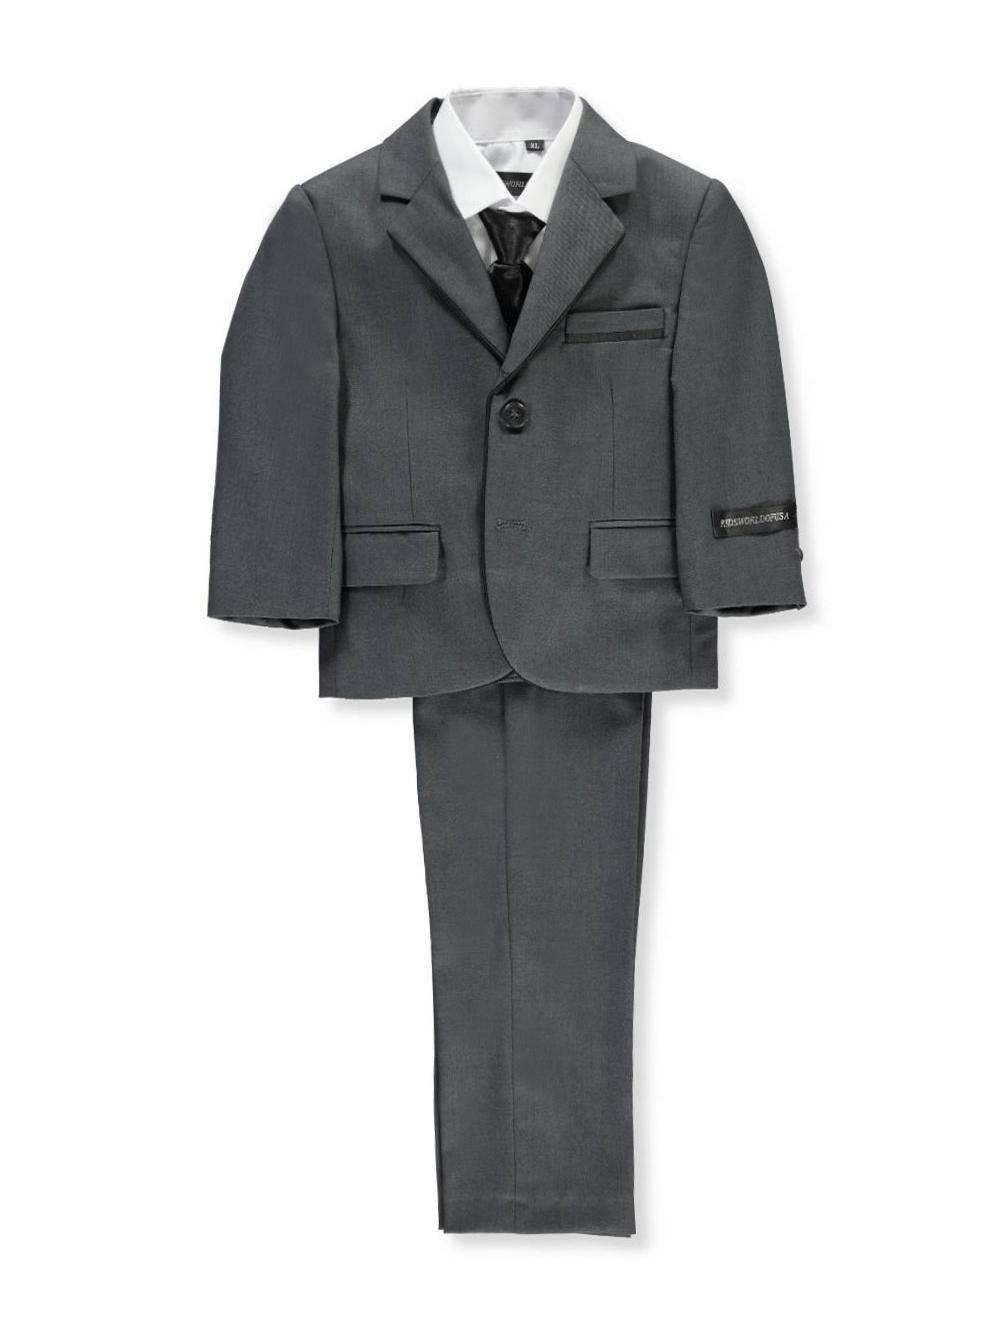 b98842a39175 Kids World Baby Boys' 5-Piece Suit